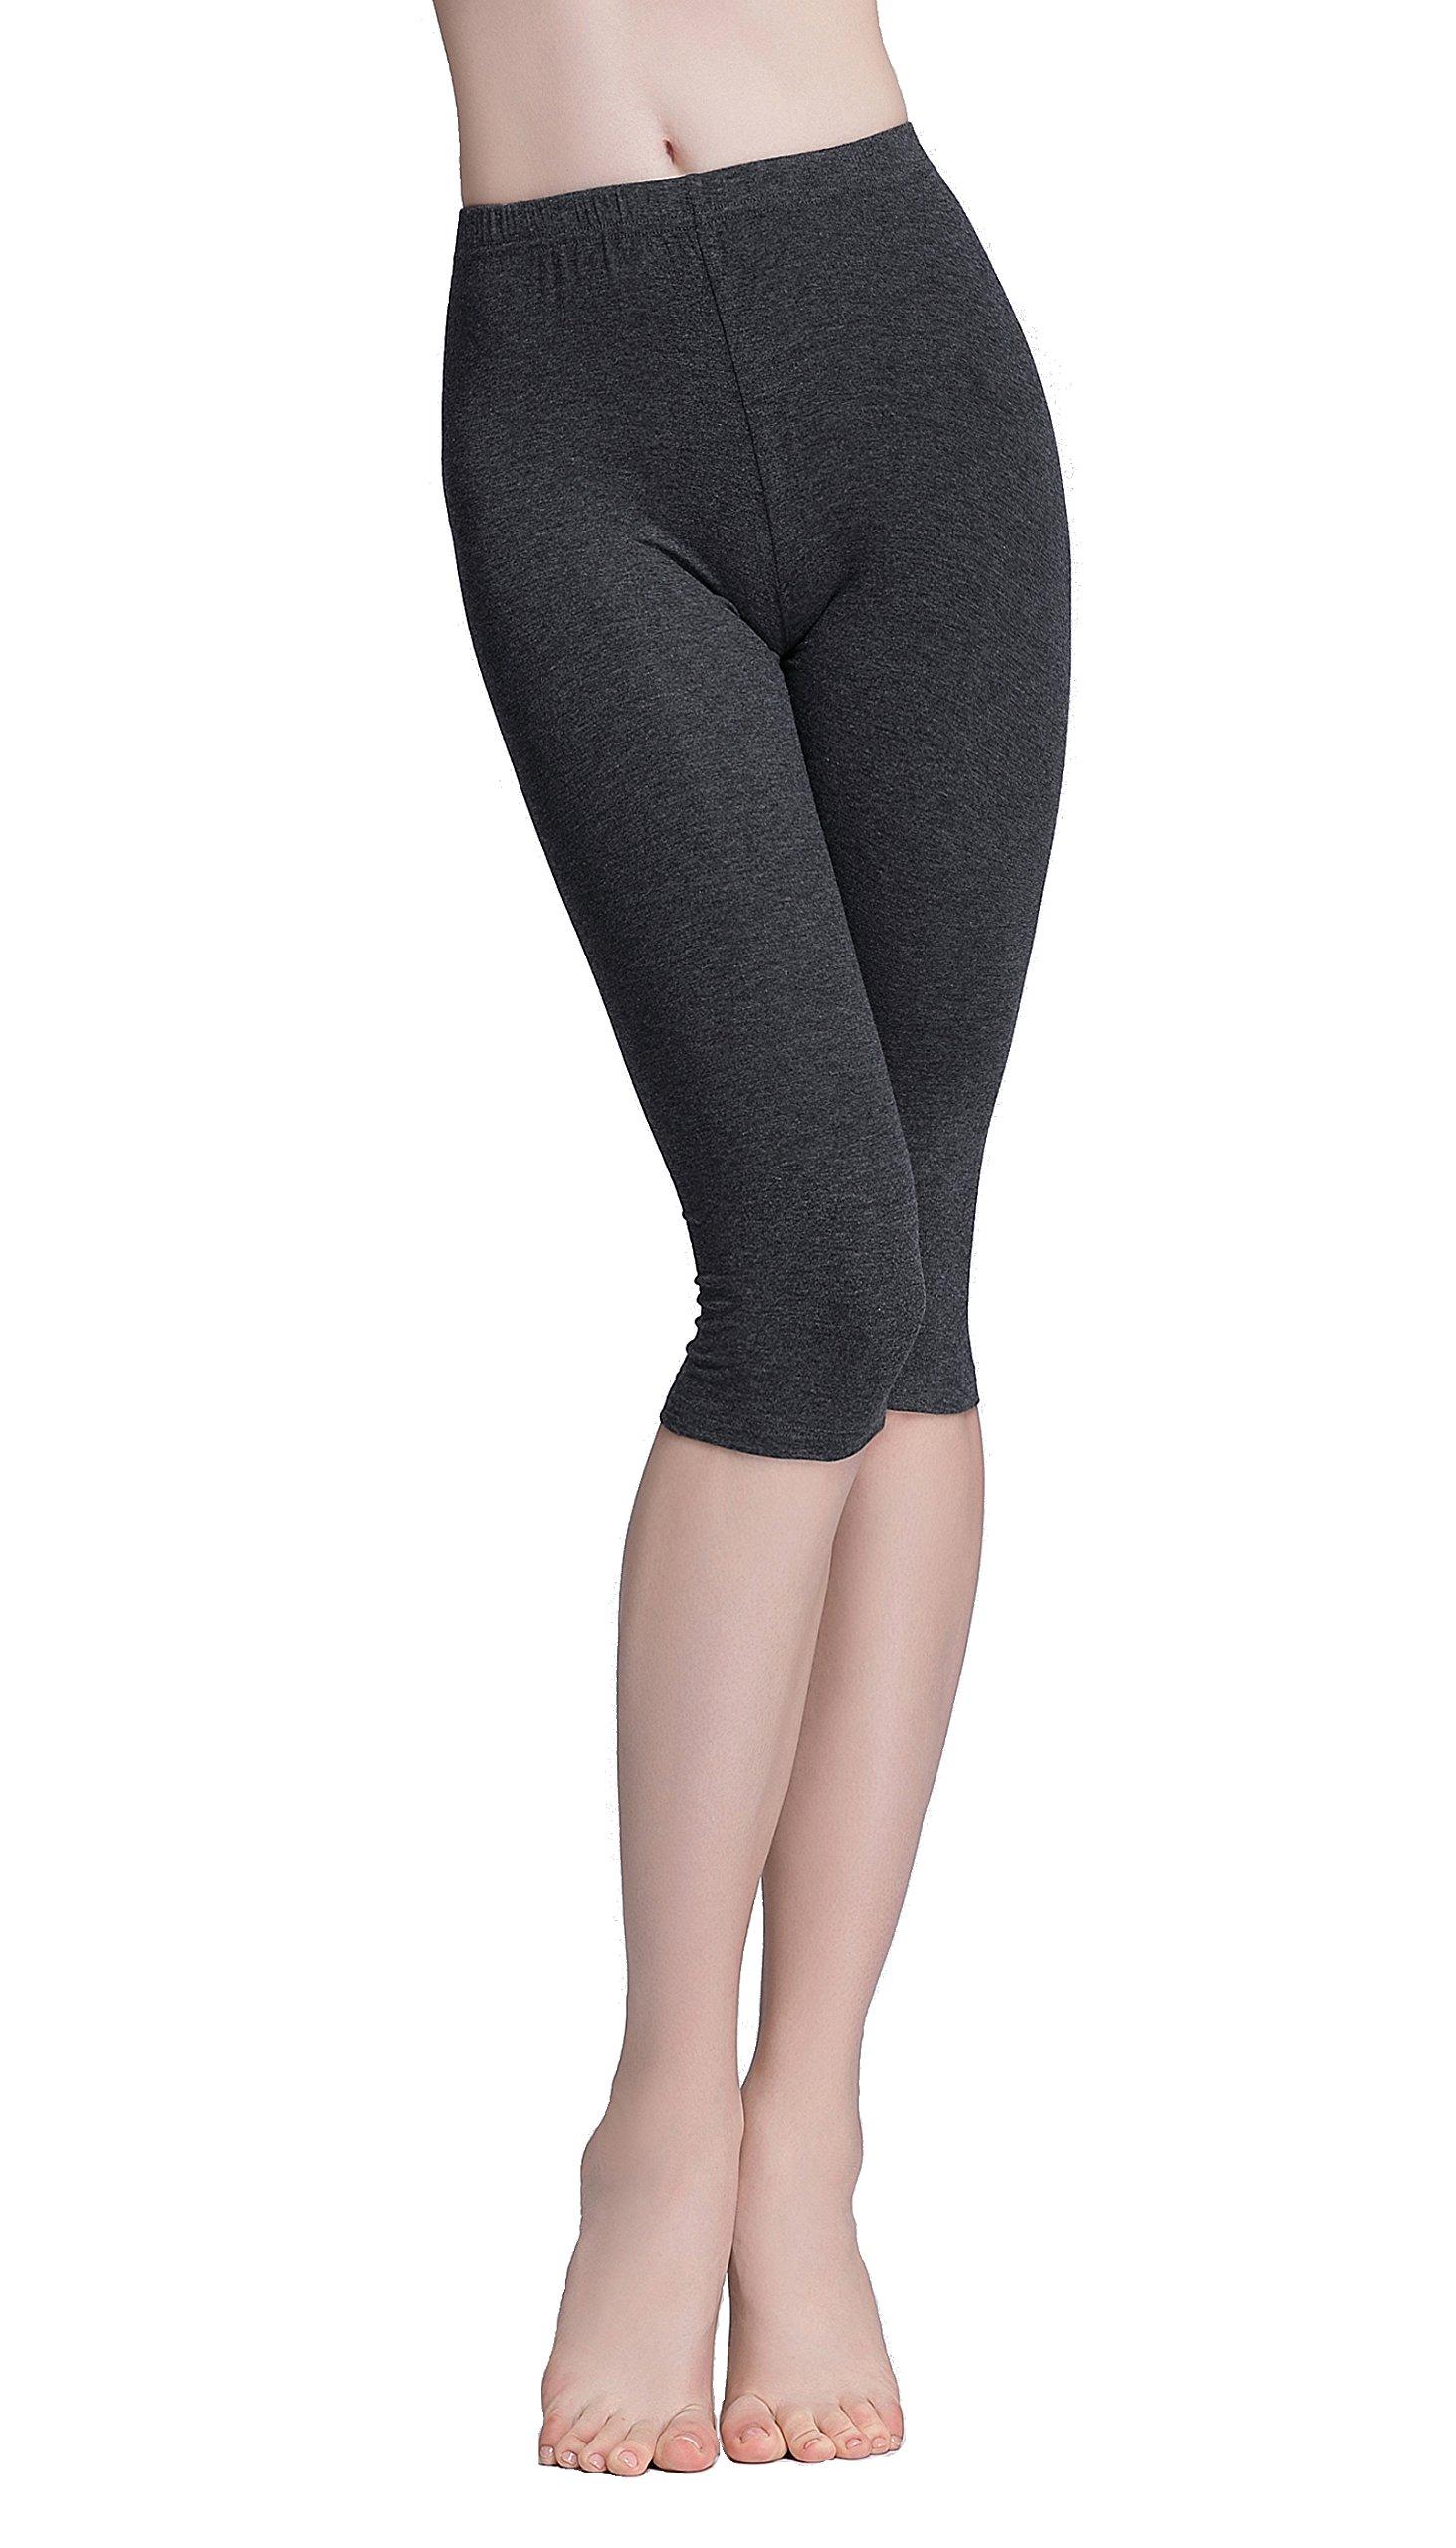 Vinconie Women Activewear Capris Stretchy Exercises Sexy Workout Leggings Soft by Vinconie (Image #3)